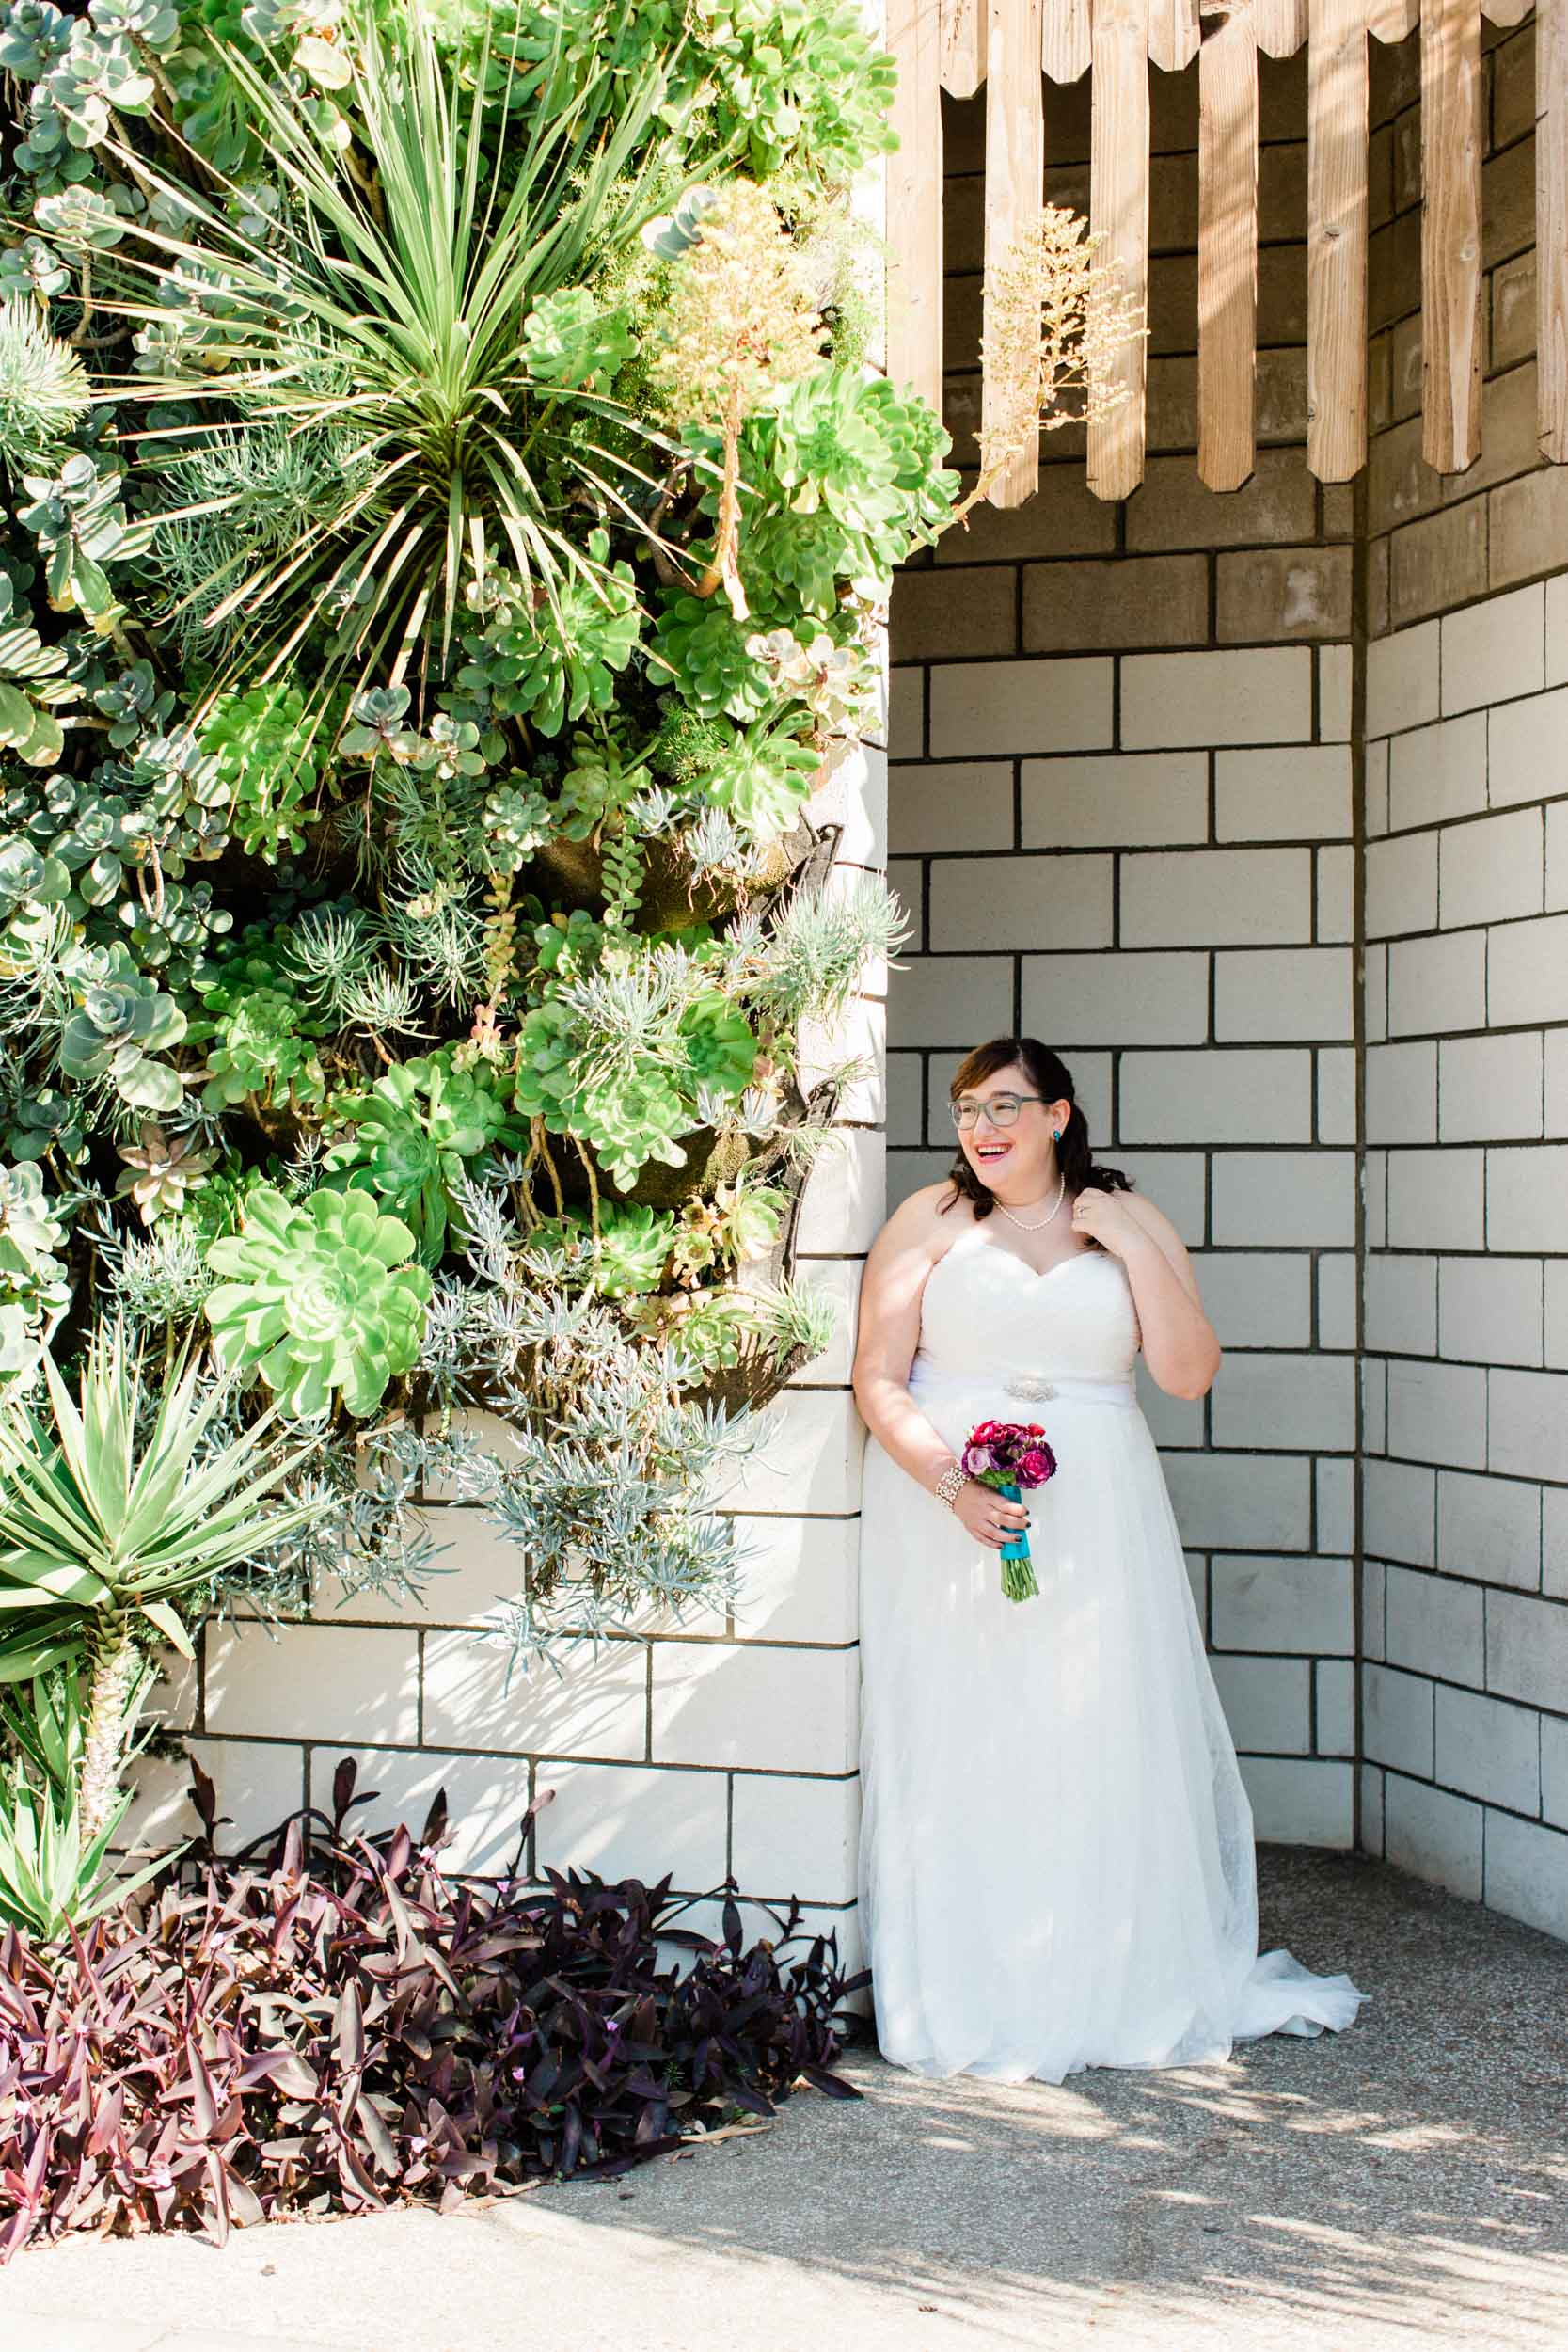 BKM-Photography-Smog-Shoppe-Culver-City-Wedding-Photographer-Culver-Hotel-0018.jpg